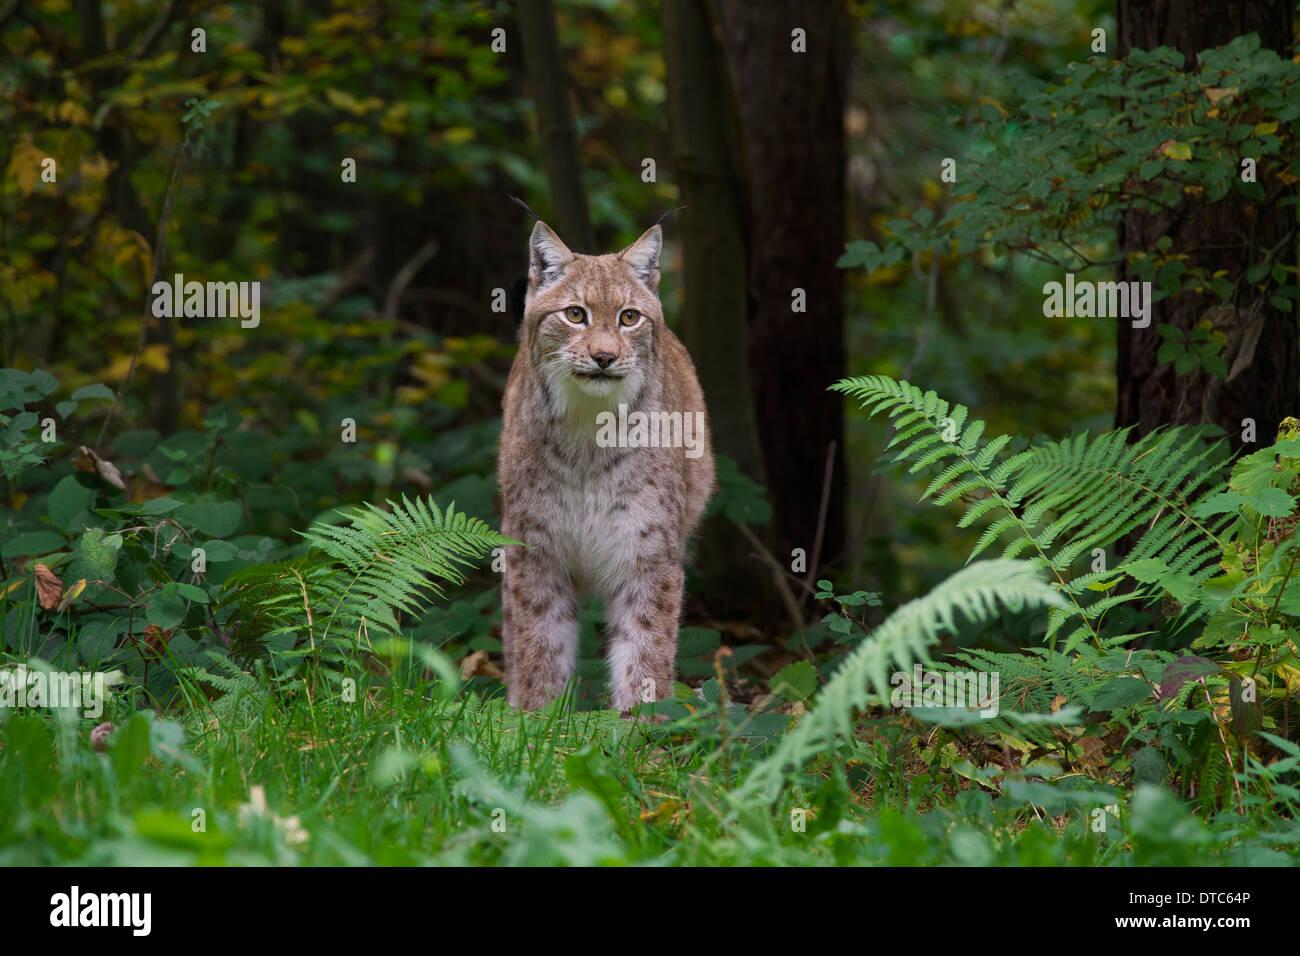 Eurasian lynx (Lynx lynx) in forest Stock Photo